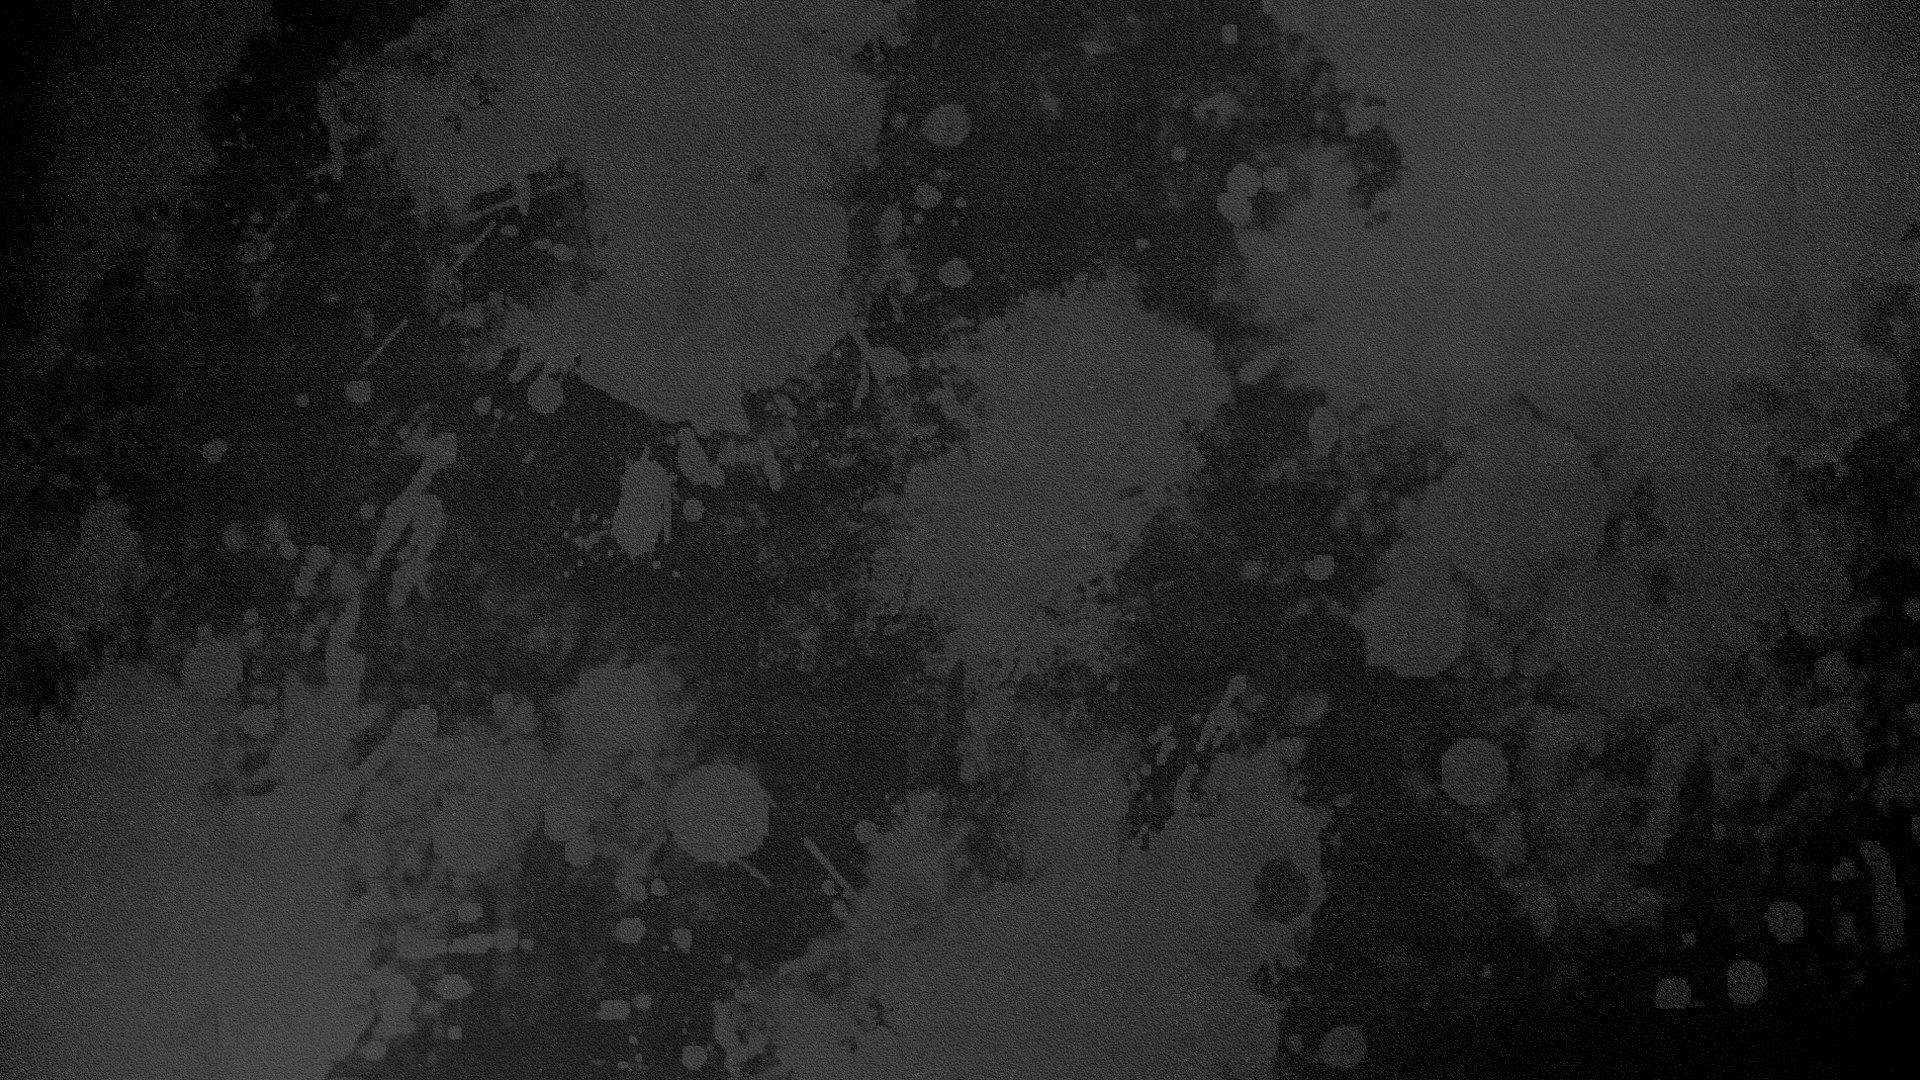 Most Inspiring Wallpaper Macbook Grunge - 63b664c6a5c9aae7304d170eee810375  Perfect Image Reference_49468.jpg